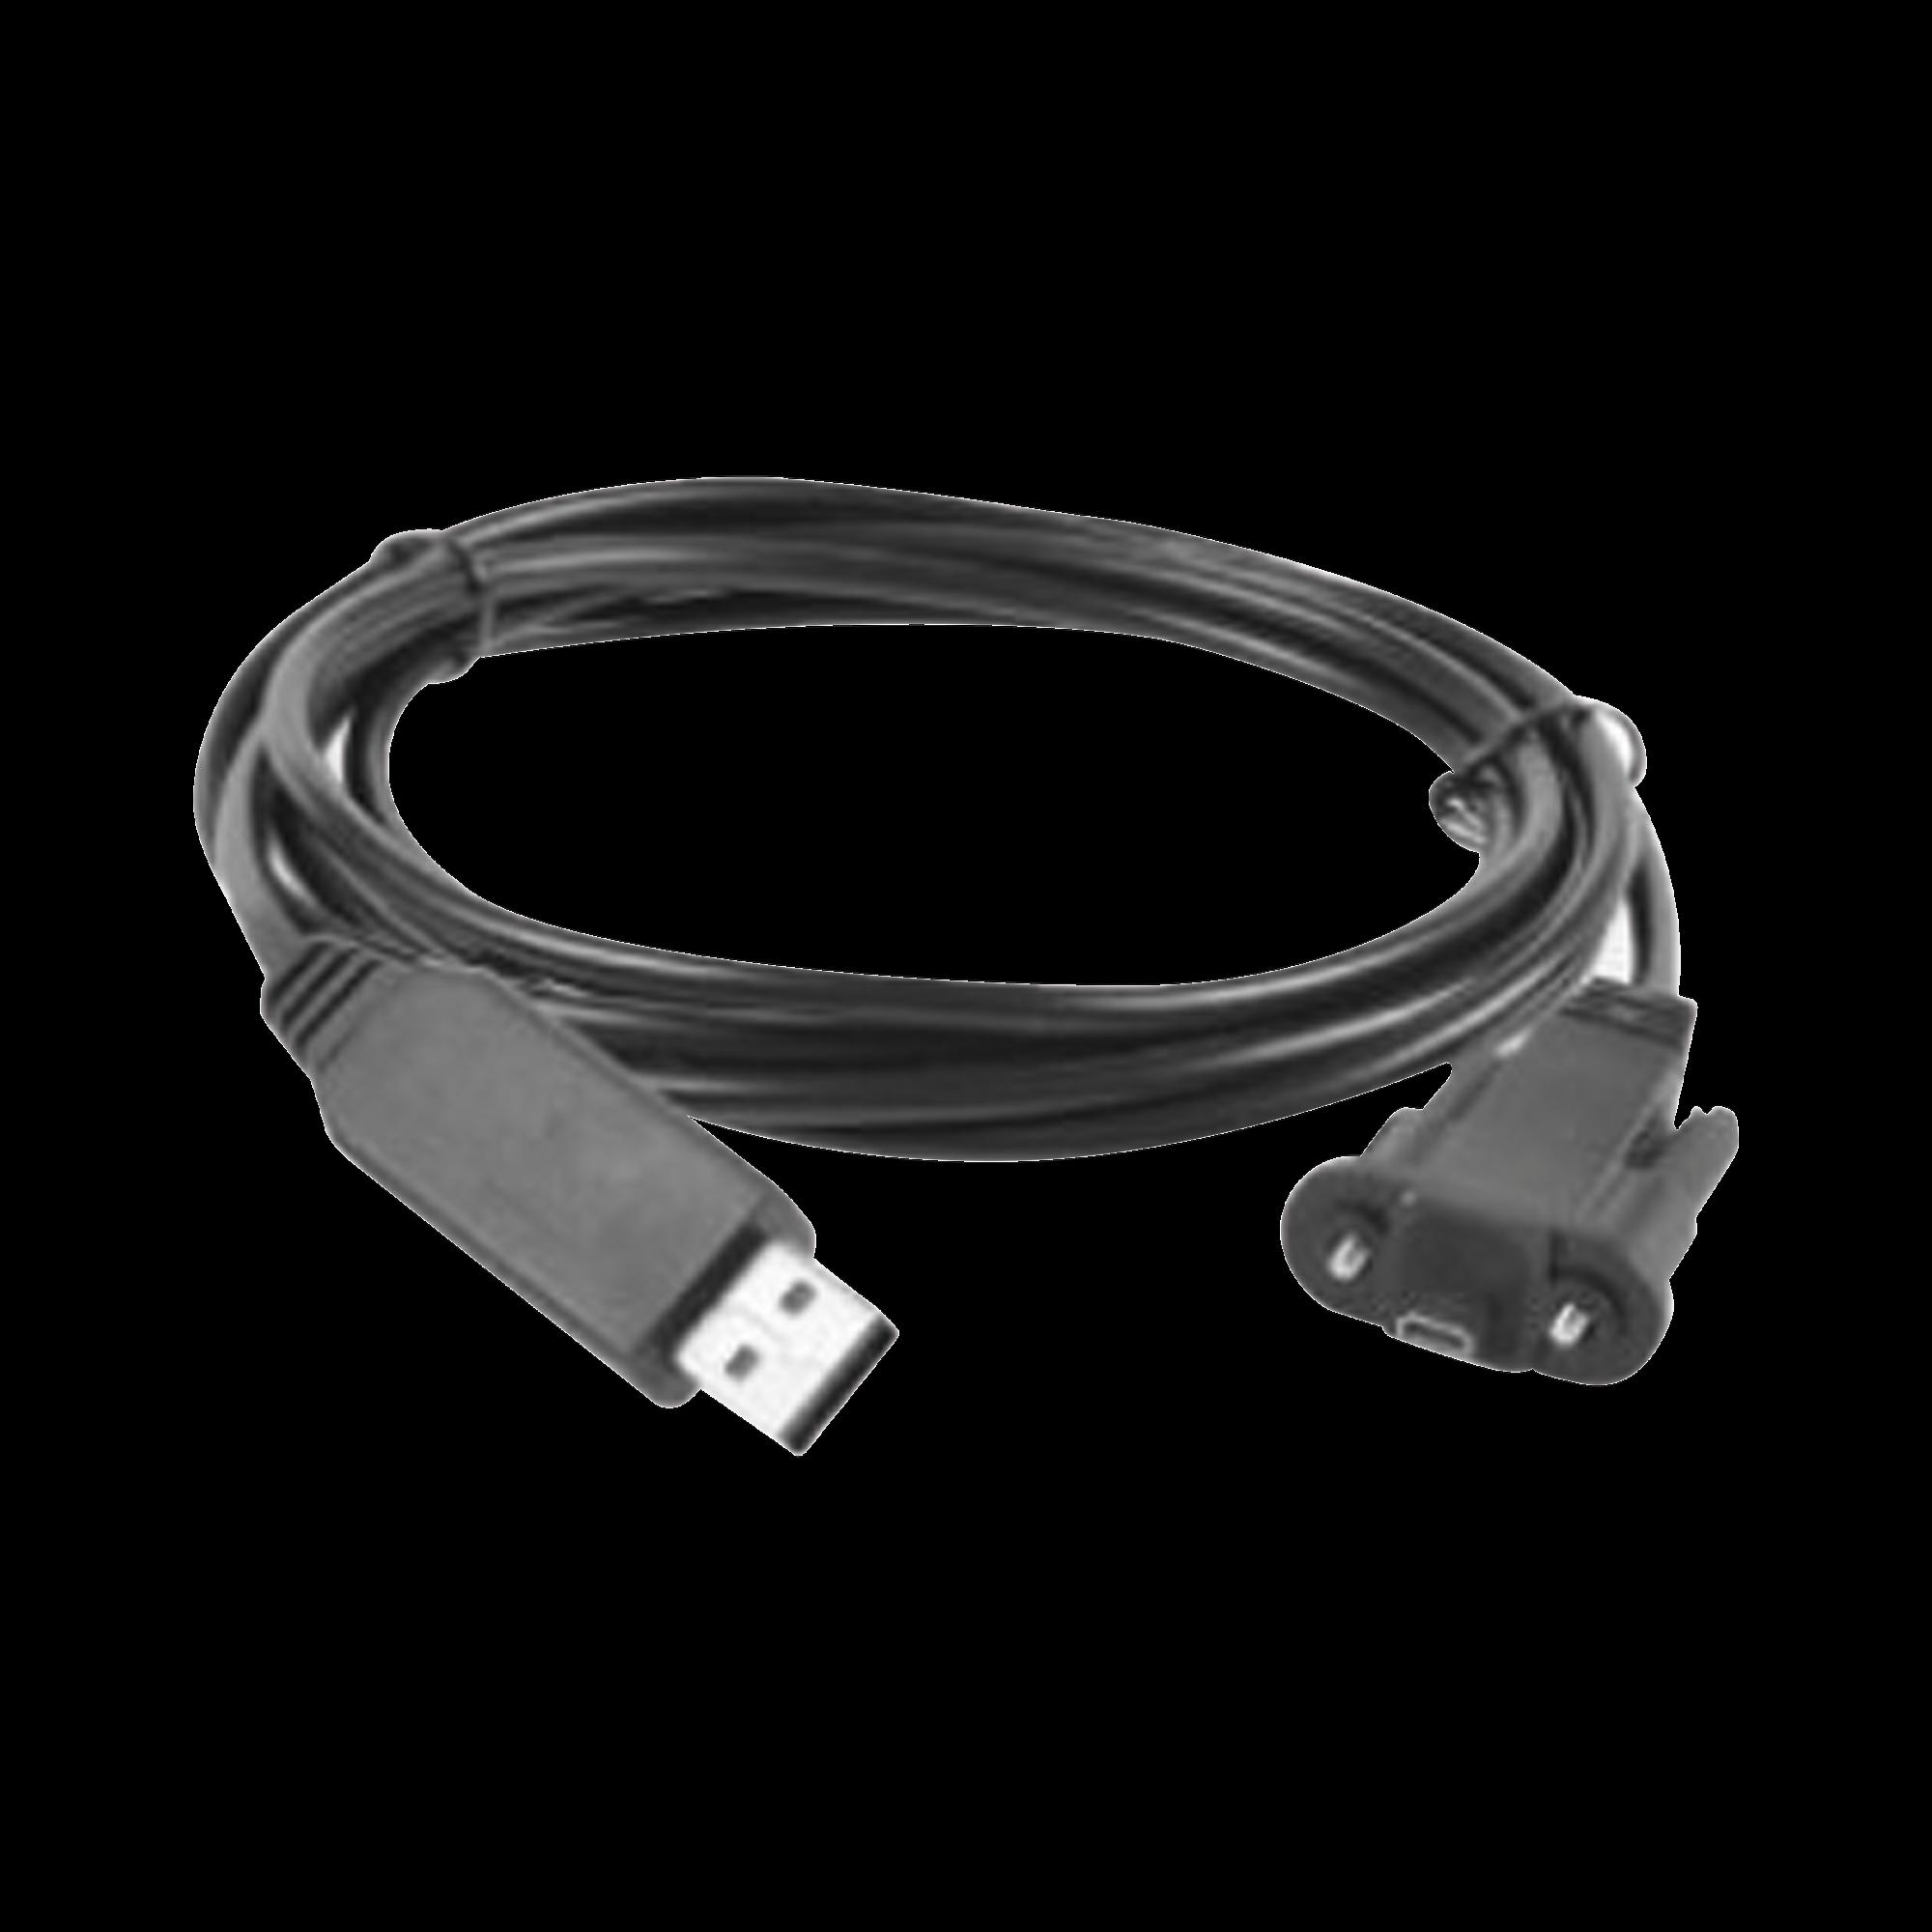 Cable de programacion para equipo GPS Satelital modelo SMARTONEC